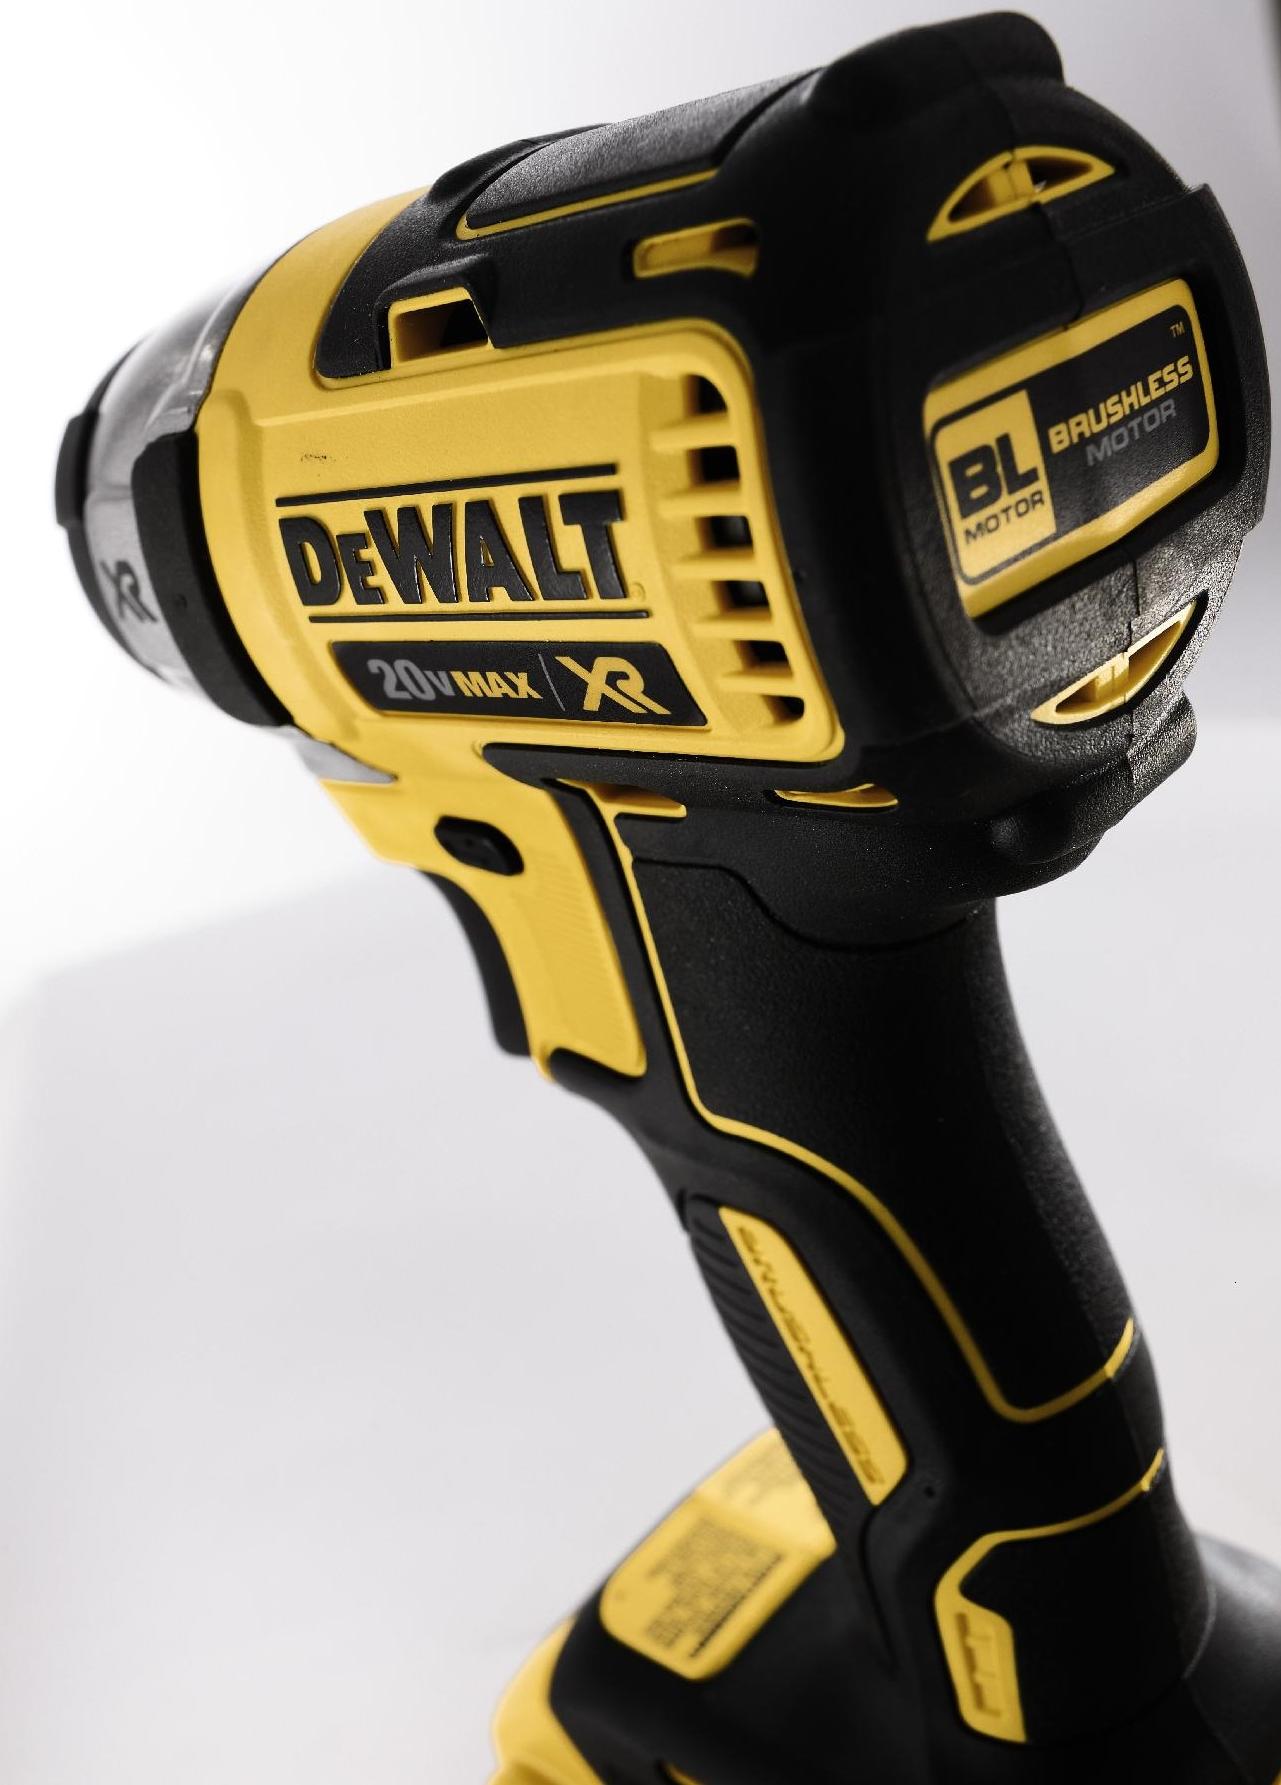 DeWalt 20 V MAX* XR Lithium Ion Brushless 1/4 In. Impact Driver Kit